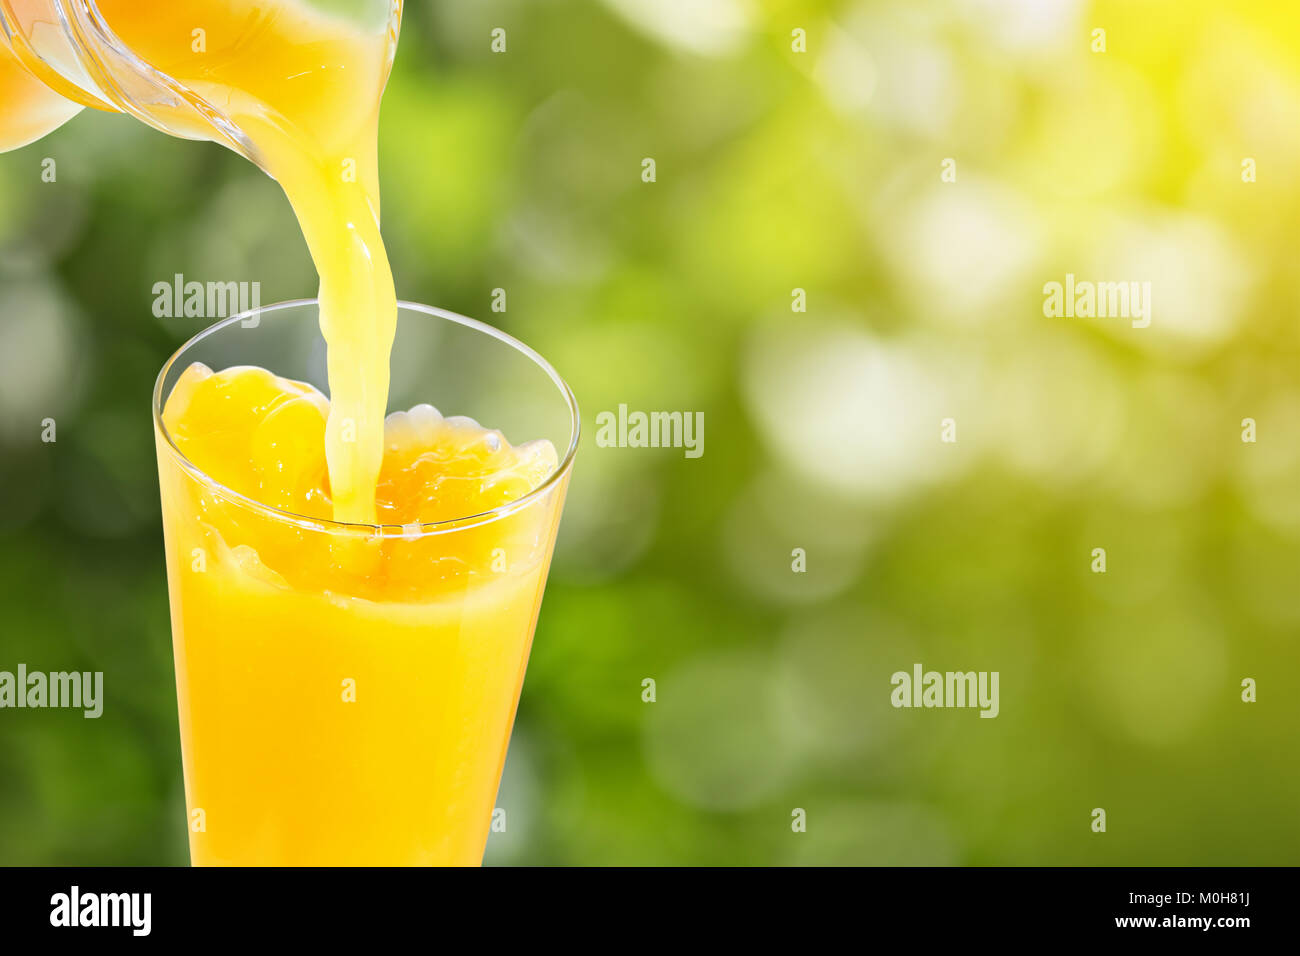 pouring orange juice - Stock Image